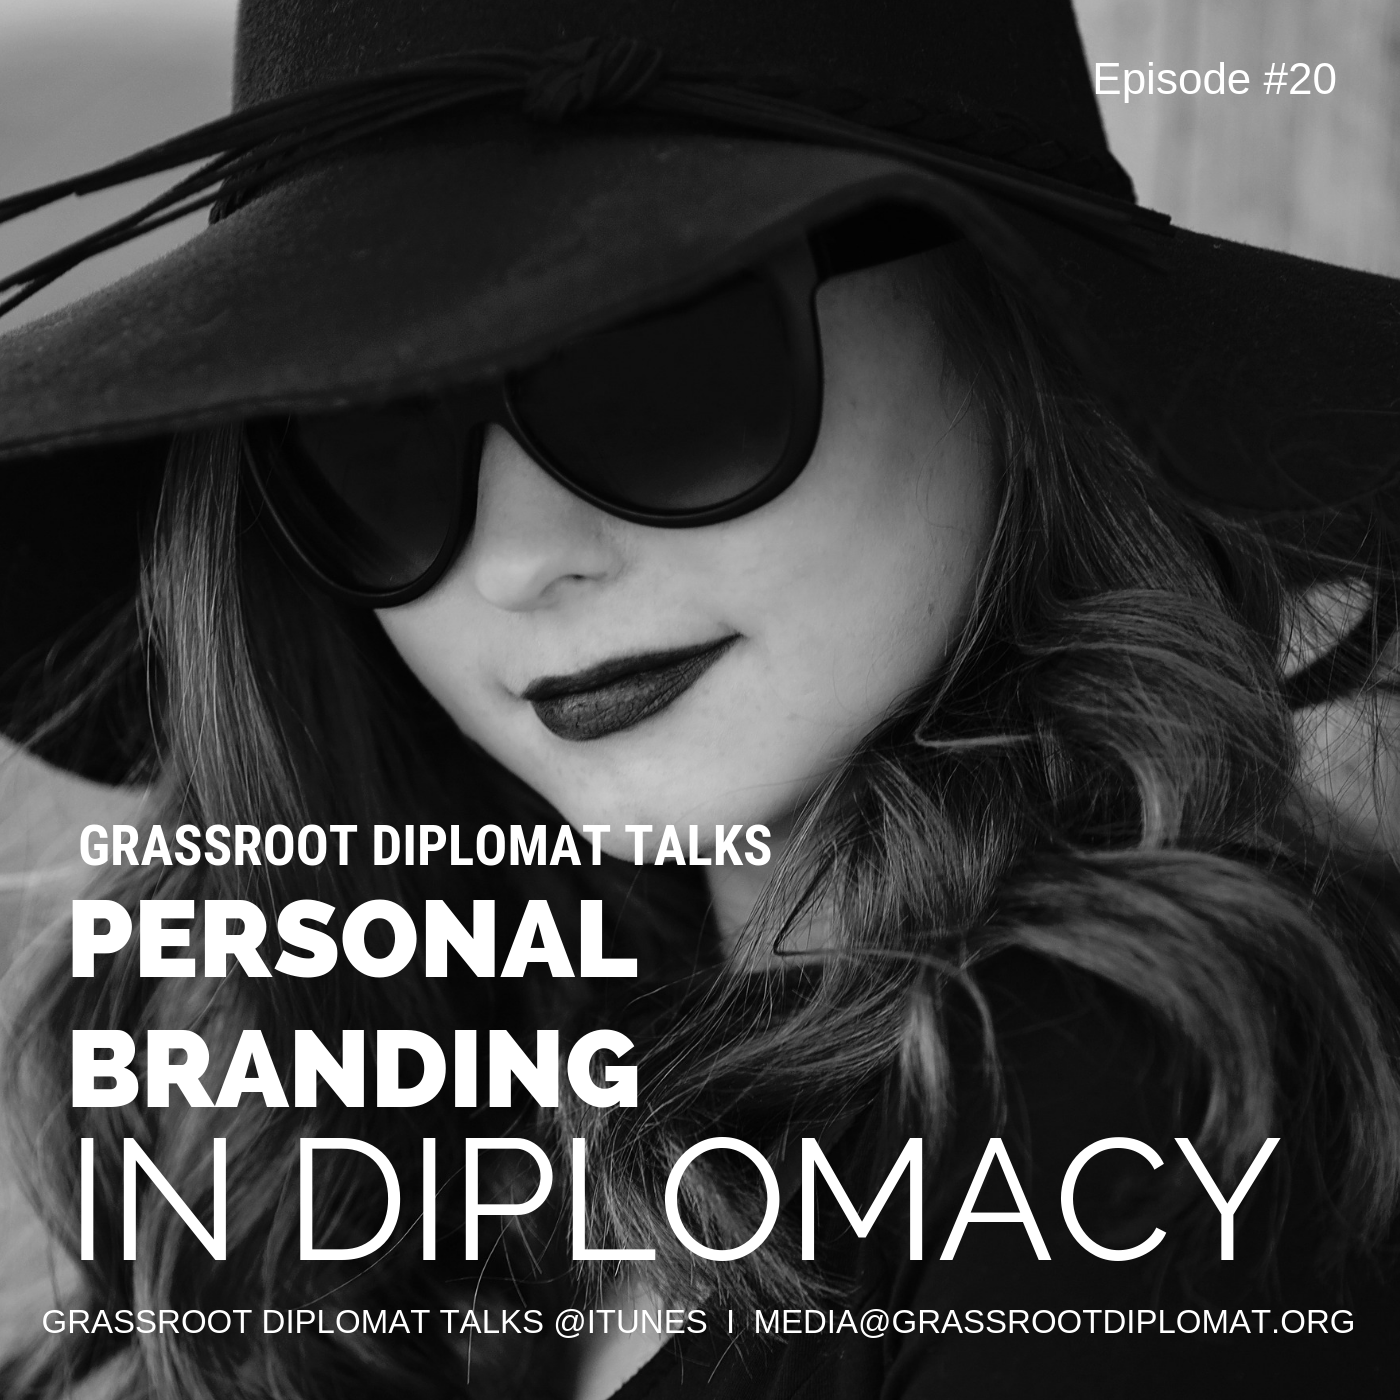 020 Personal Branding in Diplomacy.png